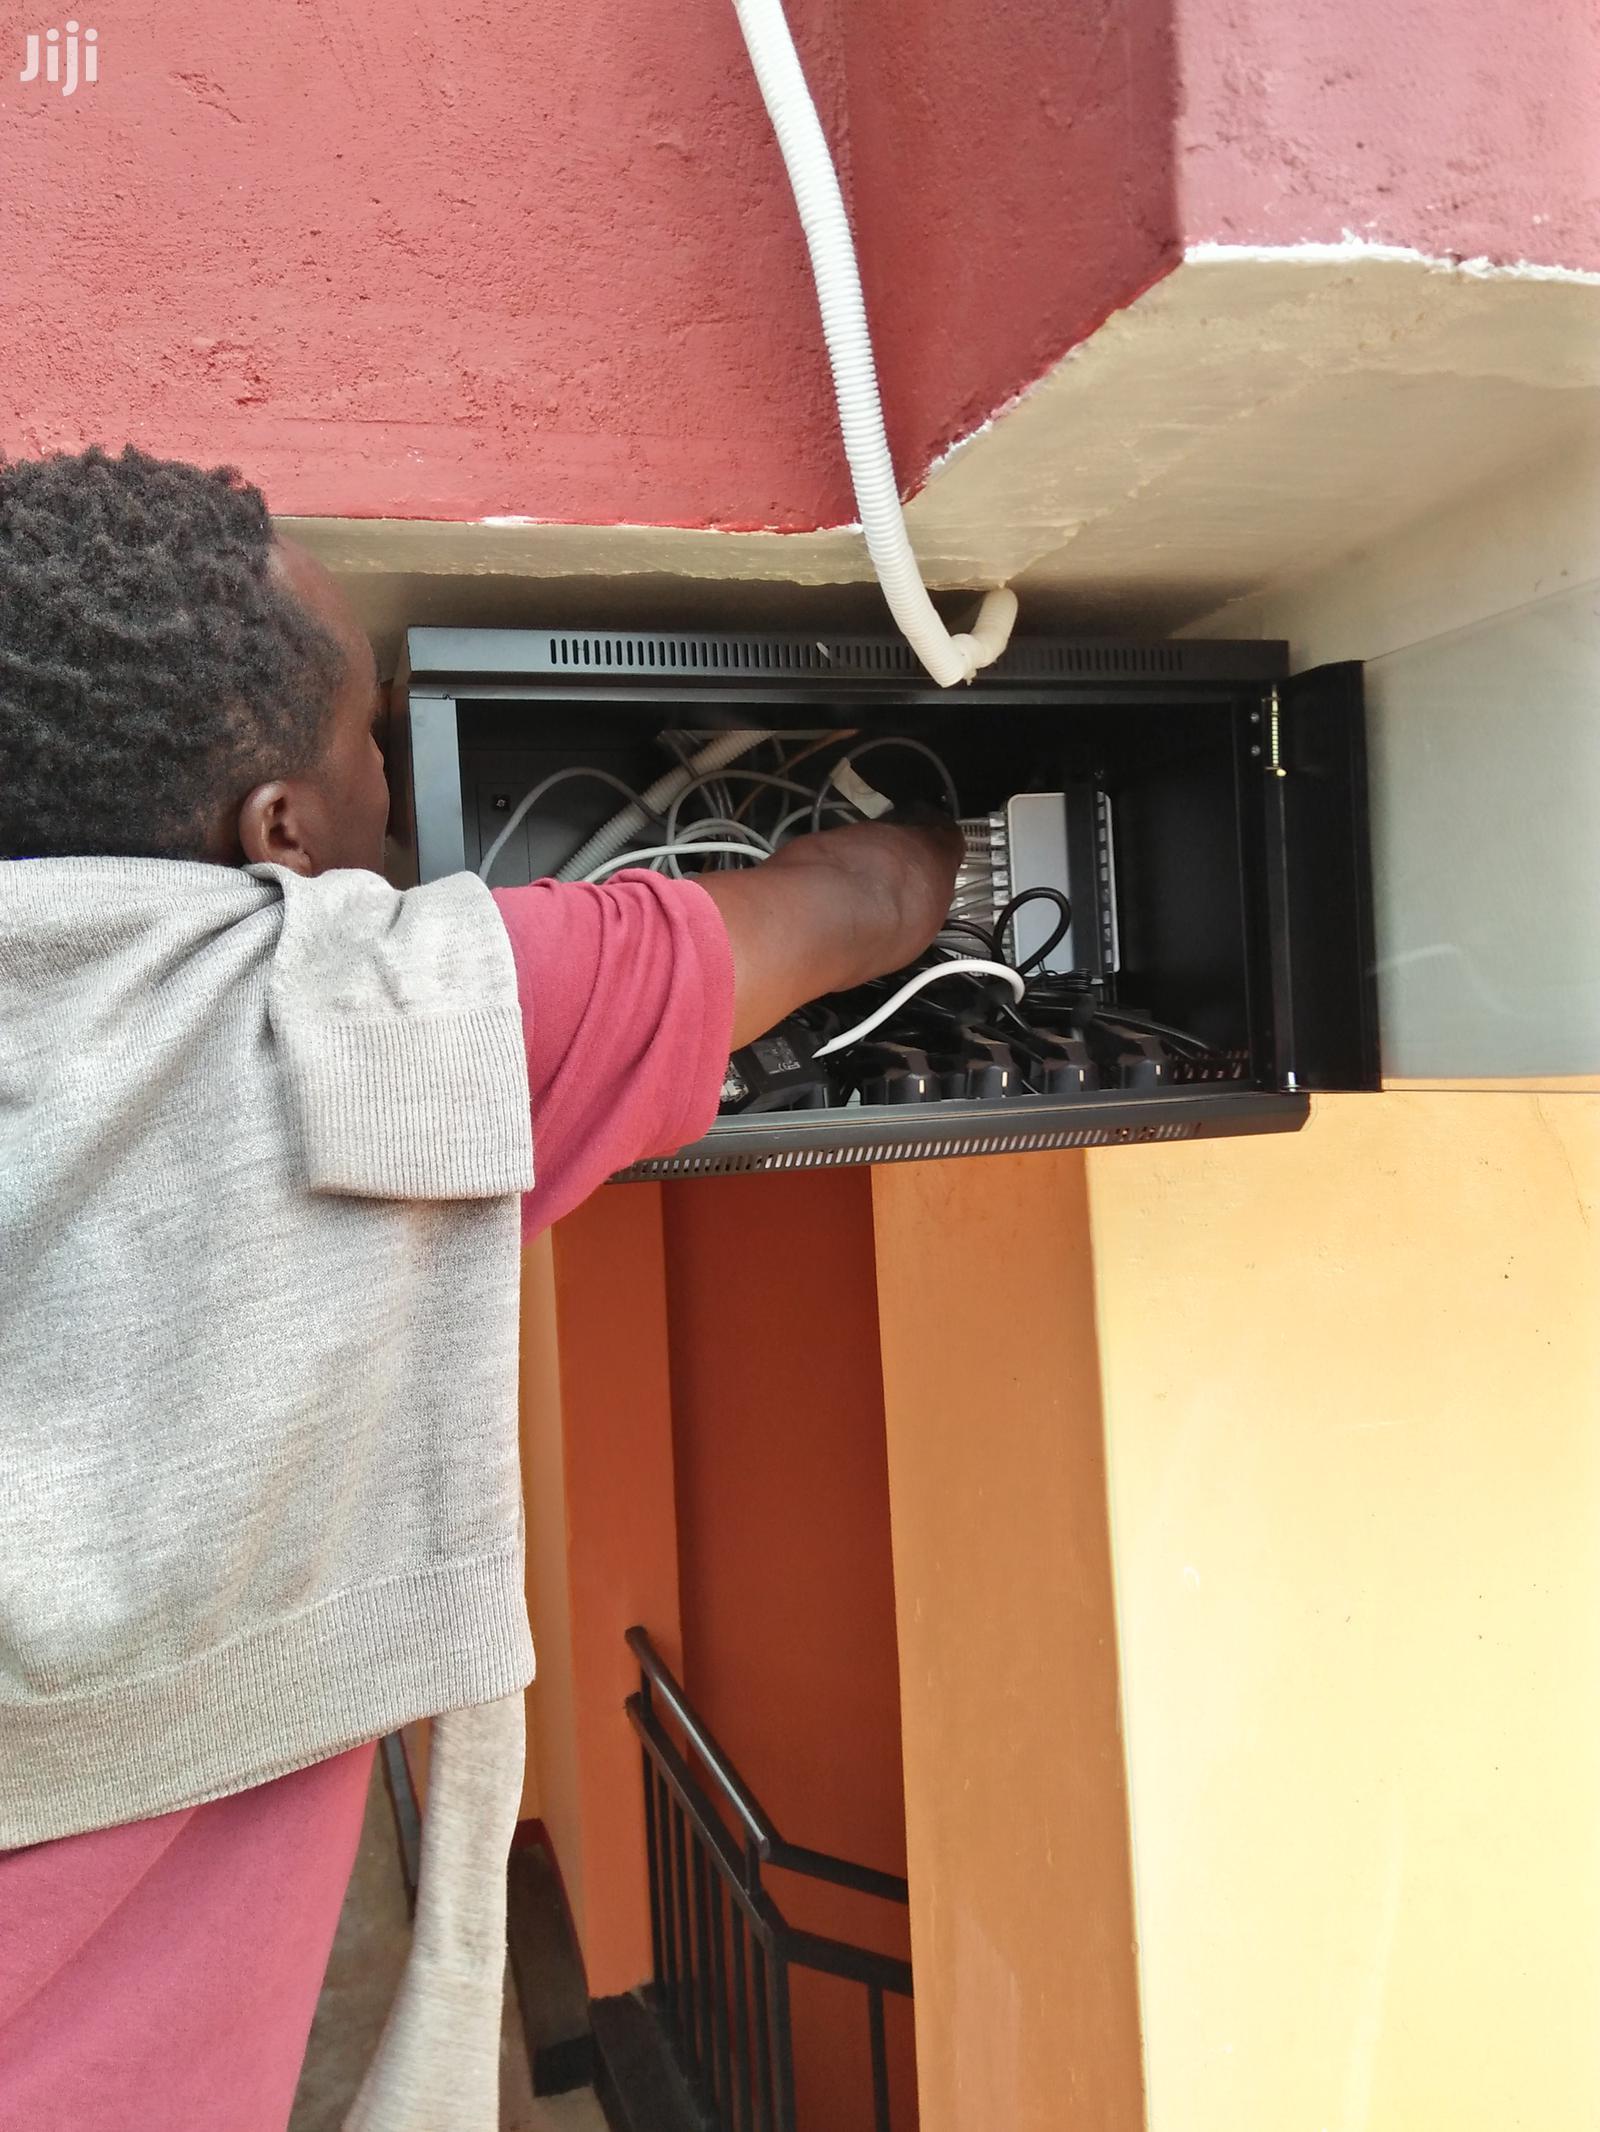 Internet Service Provider in Kiambu County   Computer & IT Services for sale in Kabete, Kiambu, Kenya